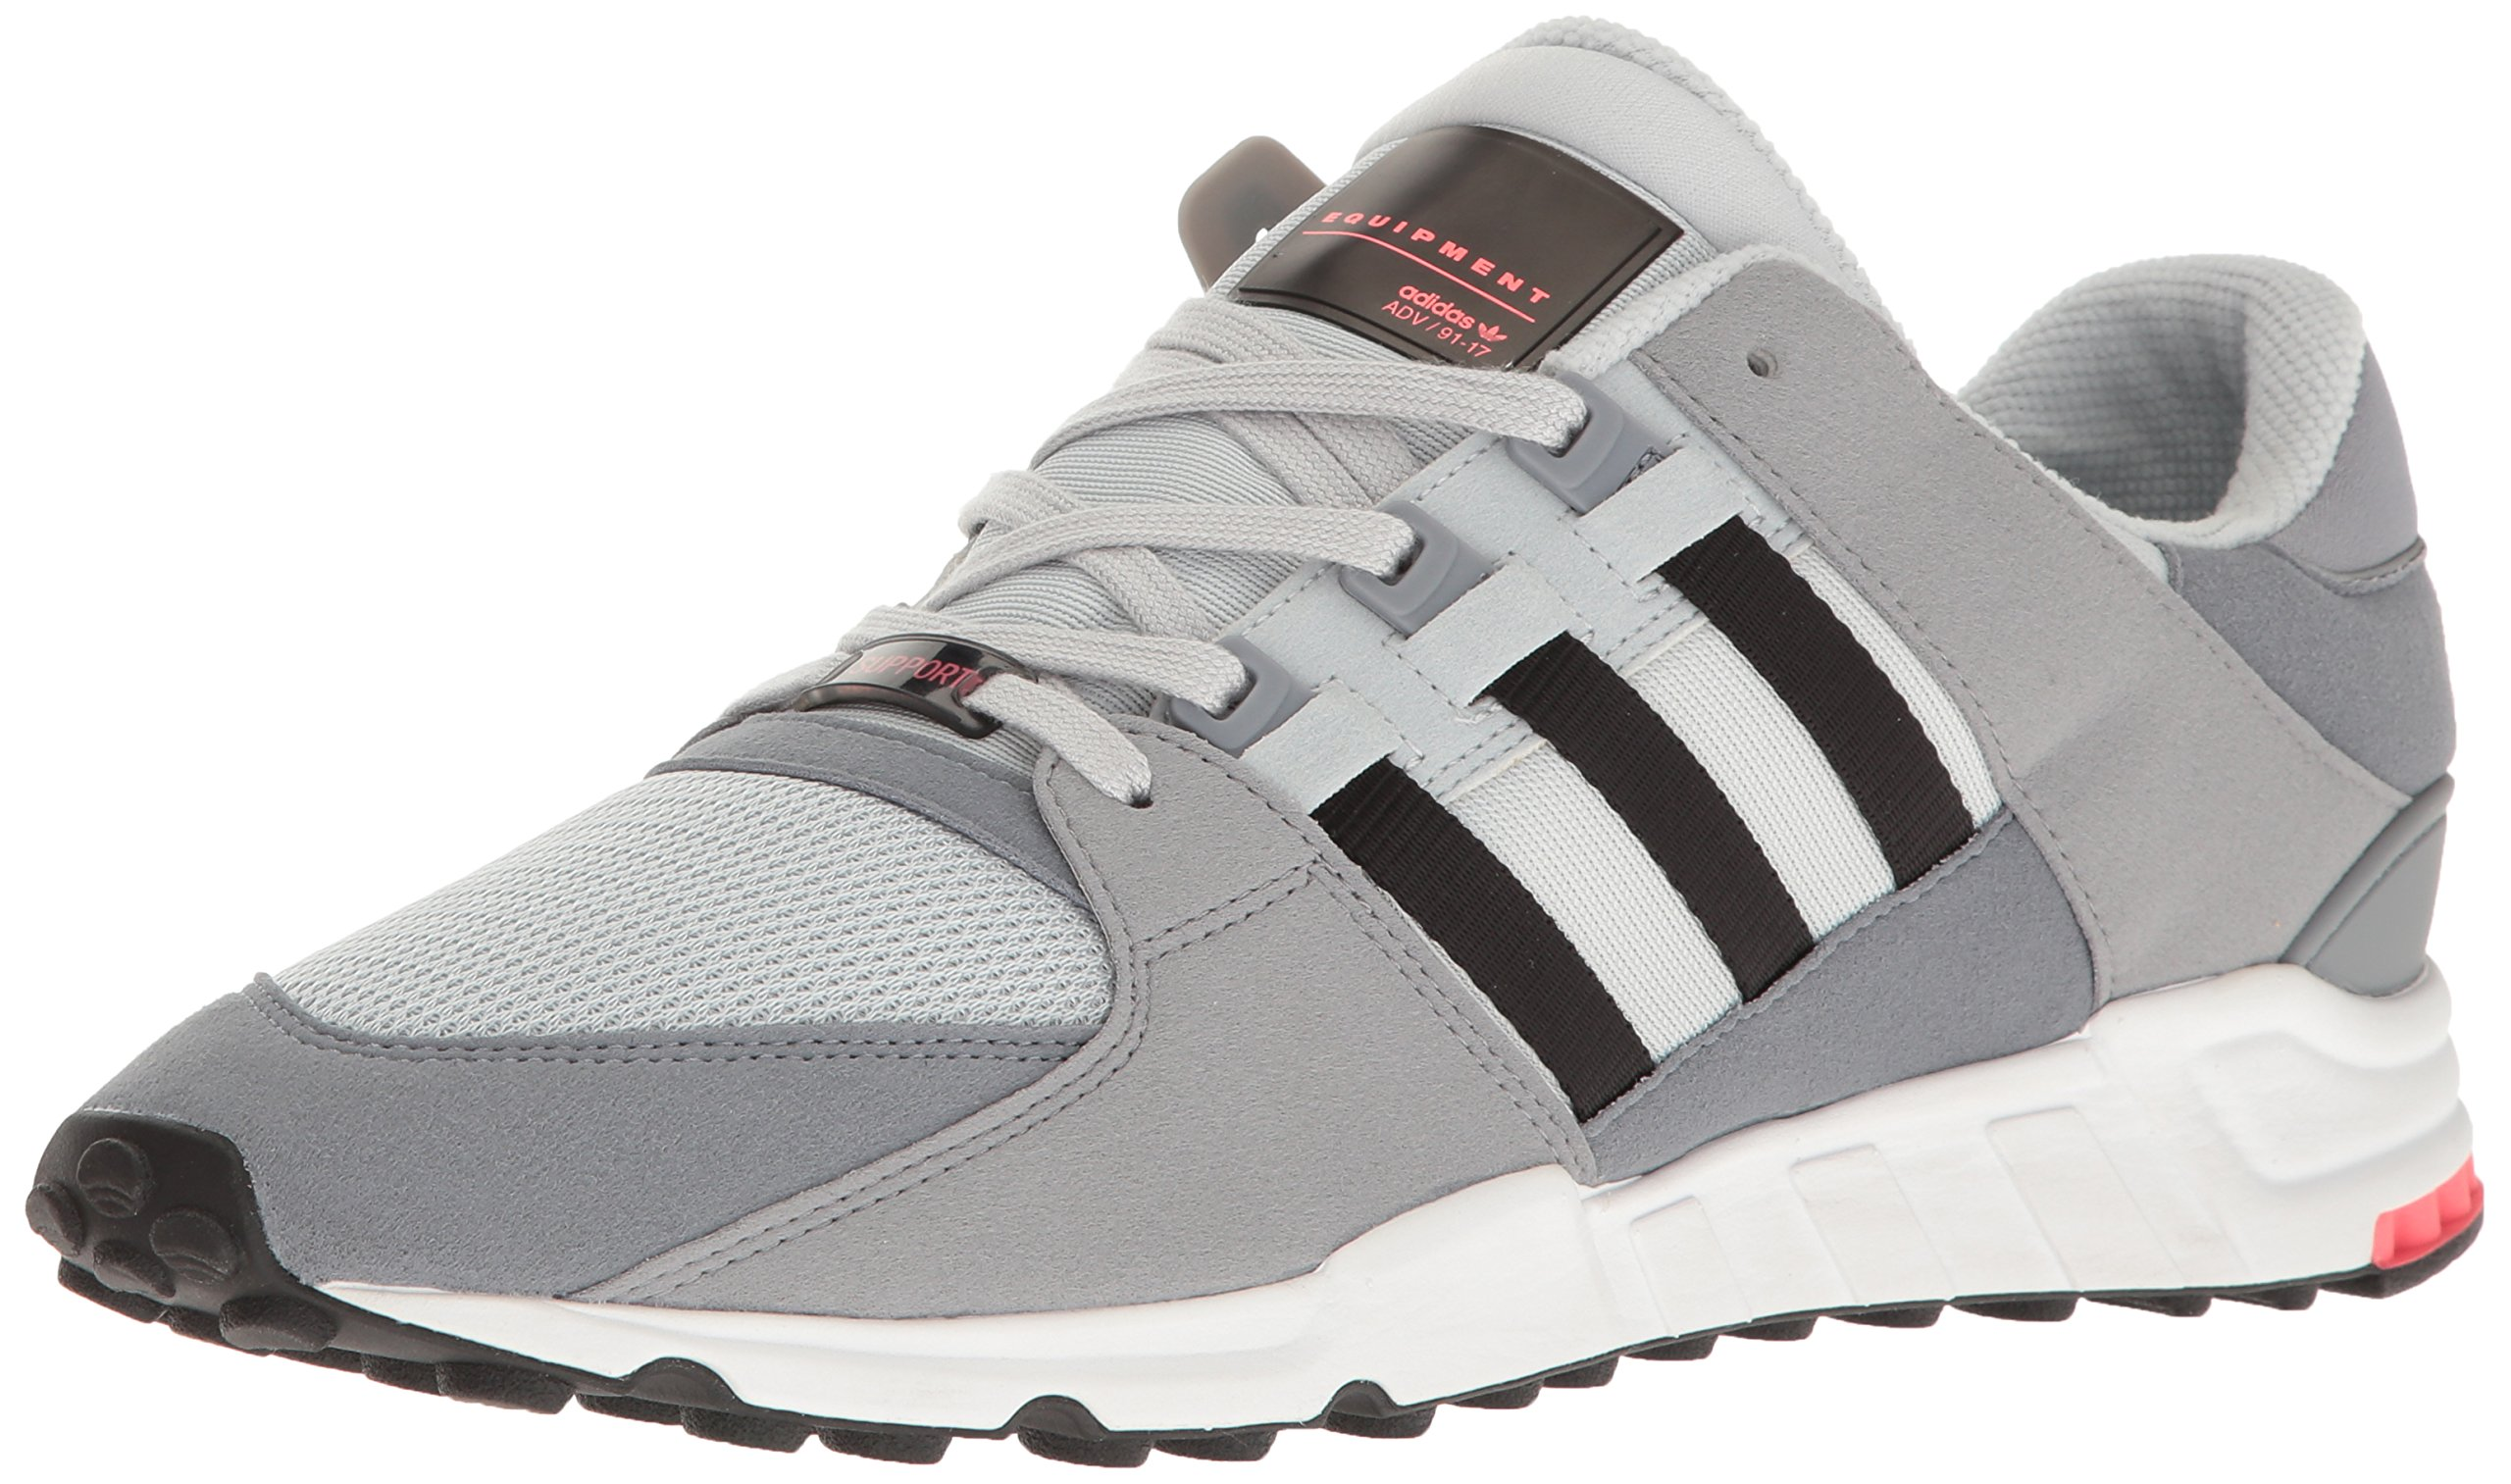 hot sale online 7c1ca a4abe Galleon - Adidas Originals Mens EQT Support RF Fashion Sneaker, Light OnixBlackTech  Grey Fabric, (11 M US)